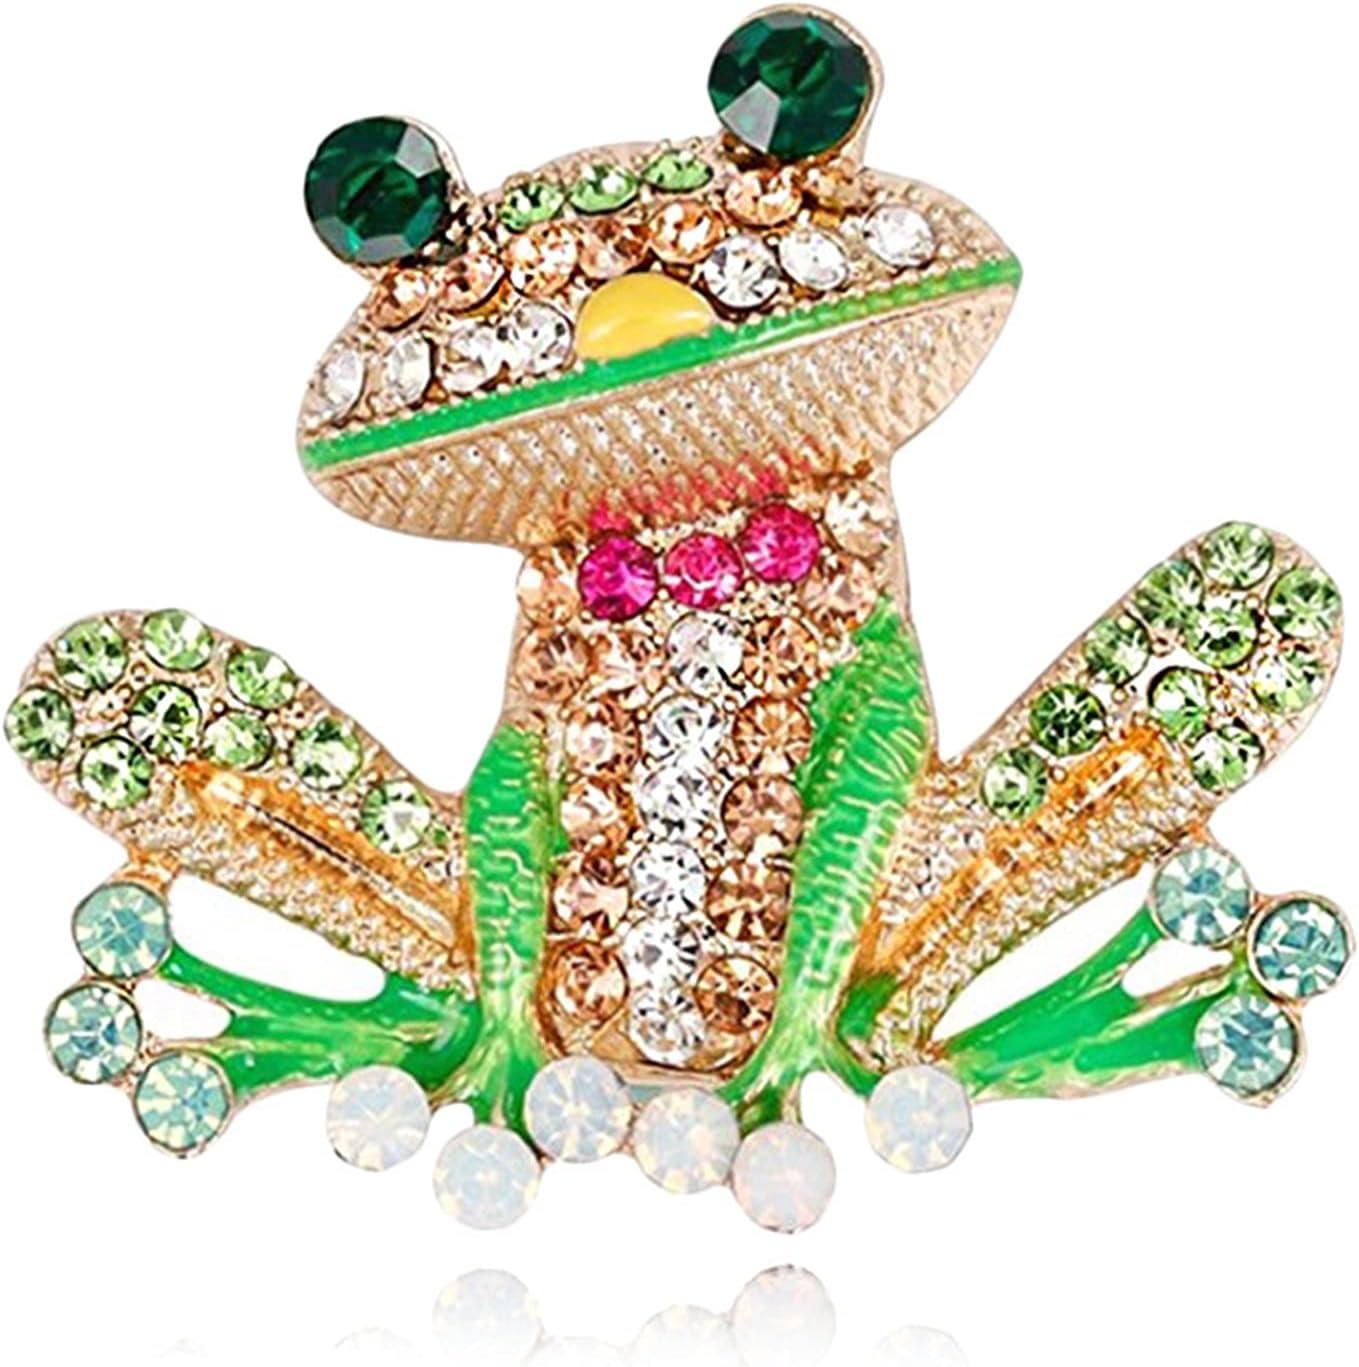 Xiaosong - Cartoon Free shipping / New Frog Sales results No. 1 Shaped Fas Brooch Electroplating Process